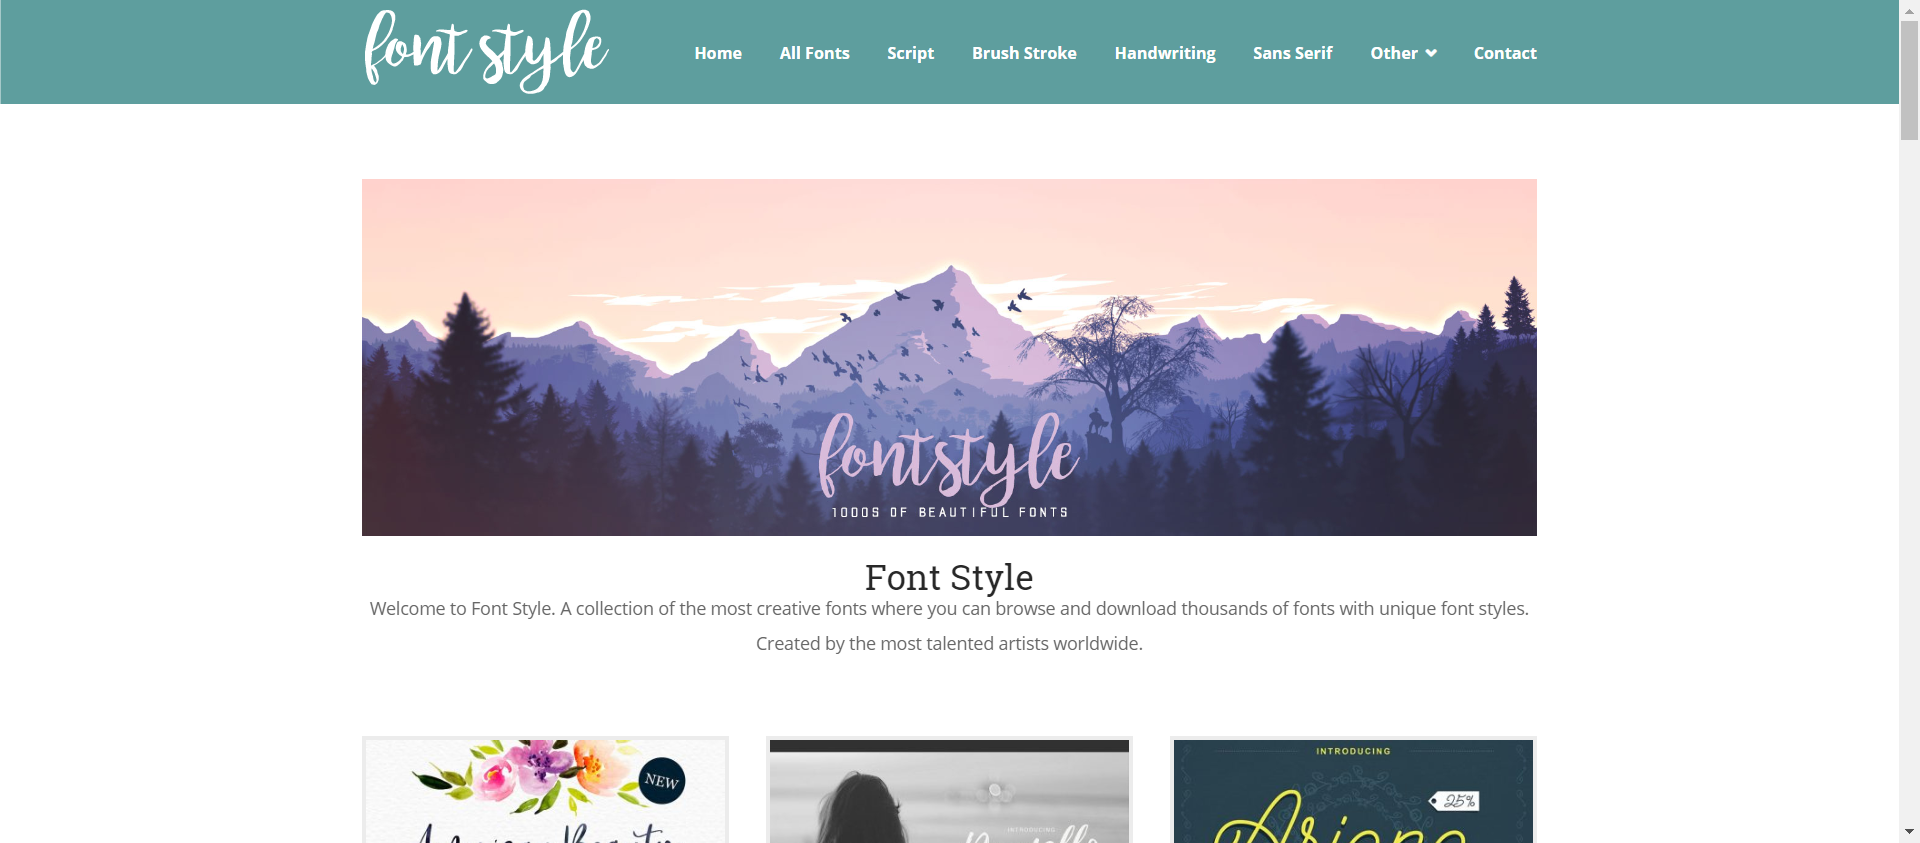 Font style website image